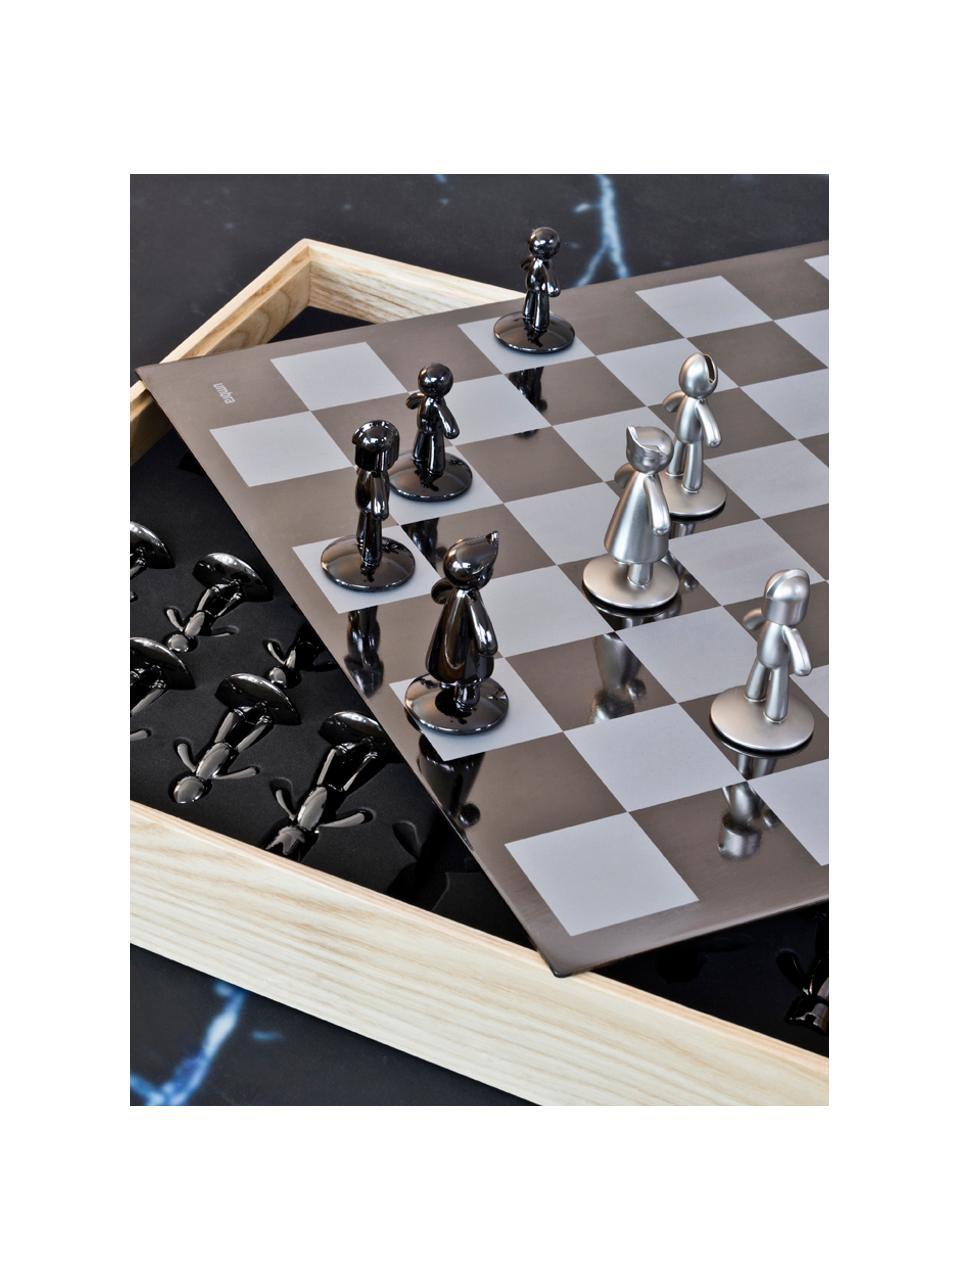 Jeu d'échecs Buddy, 33élém., Boîte : frêne Échiquier : titane Pions : nickel, titane